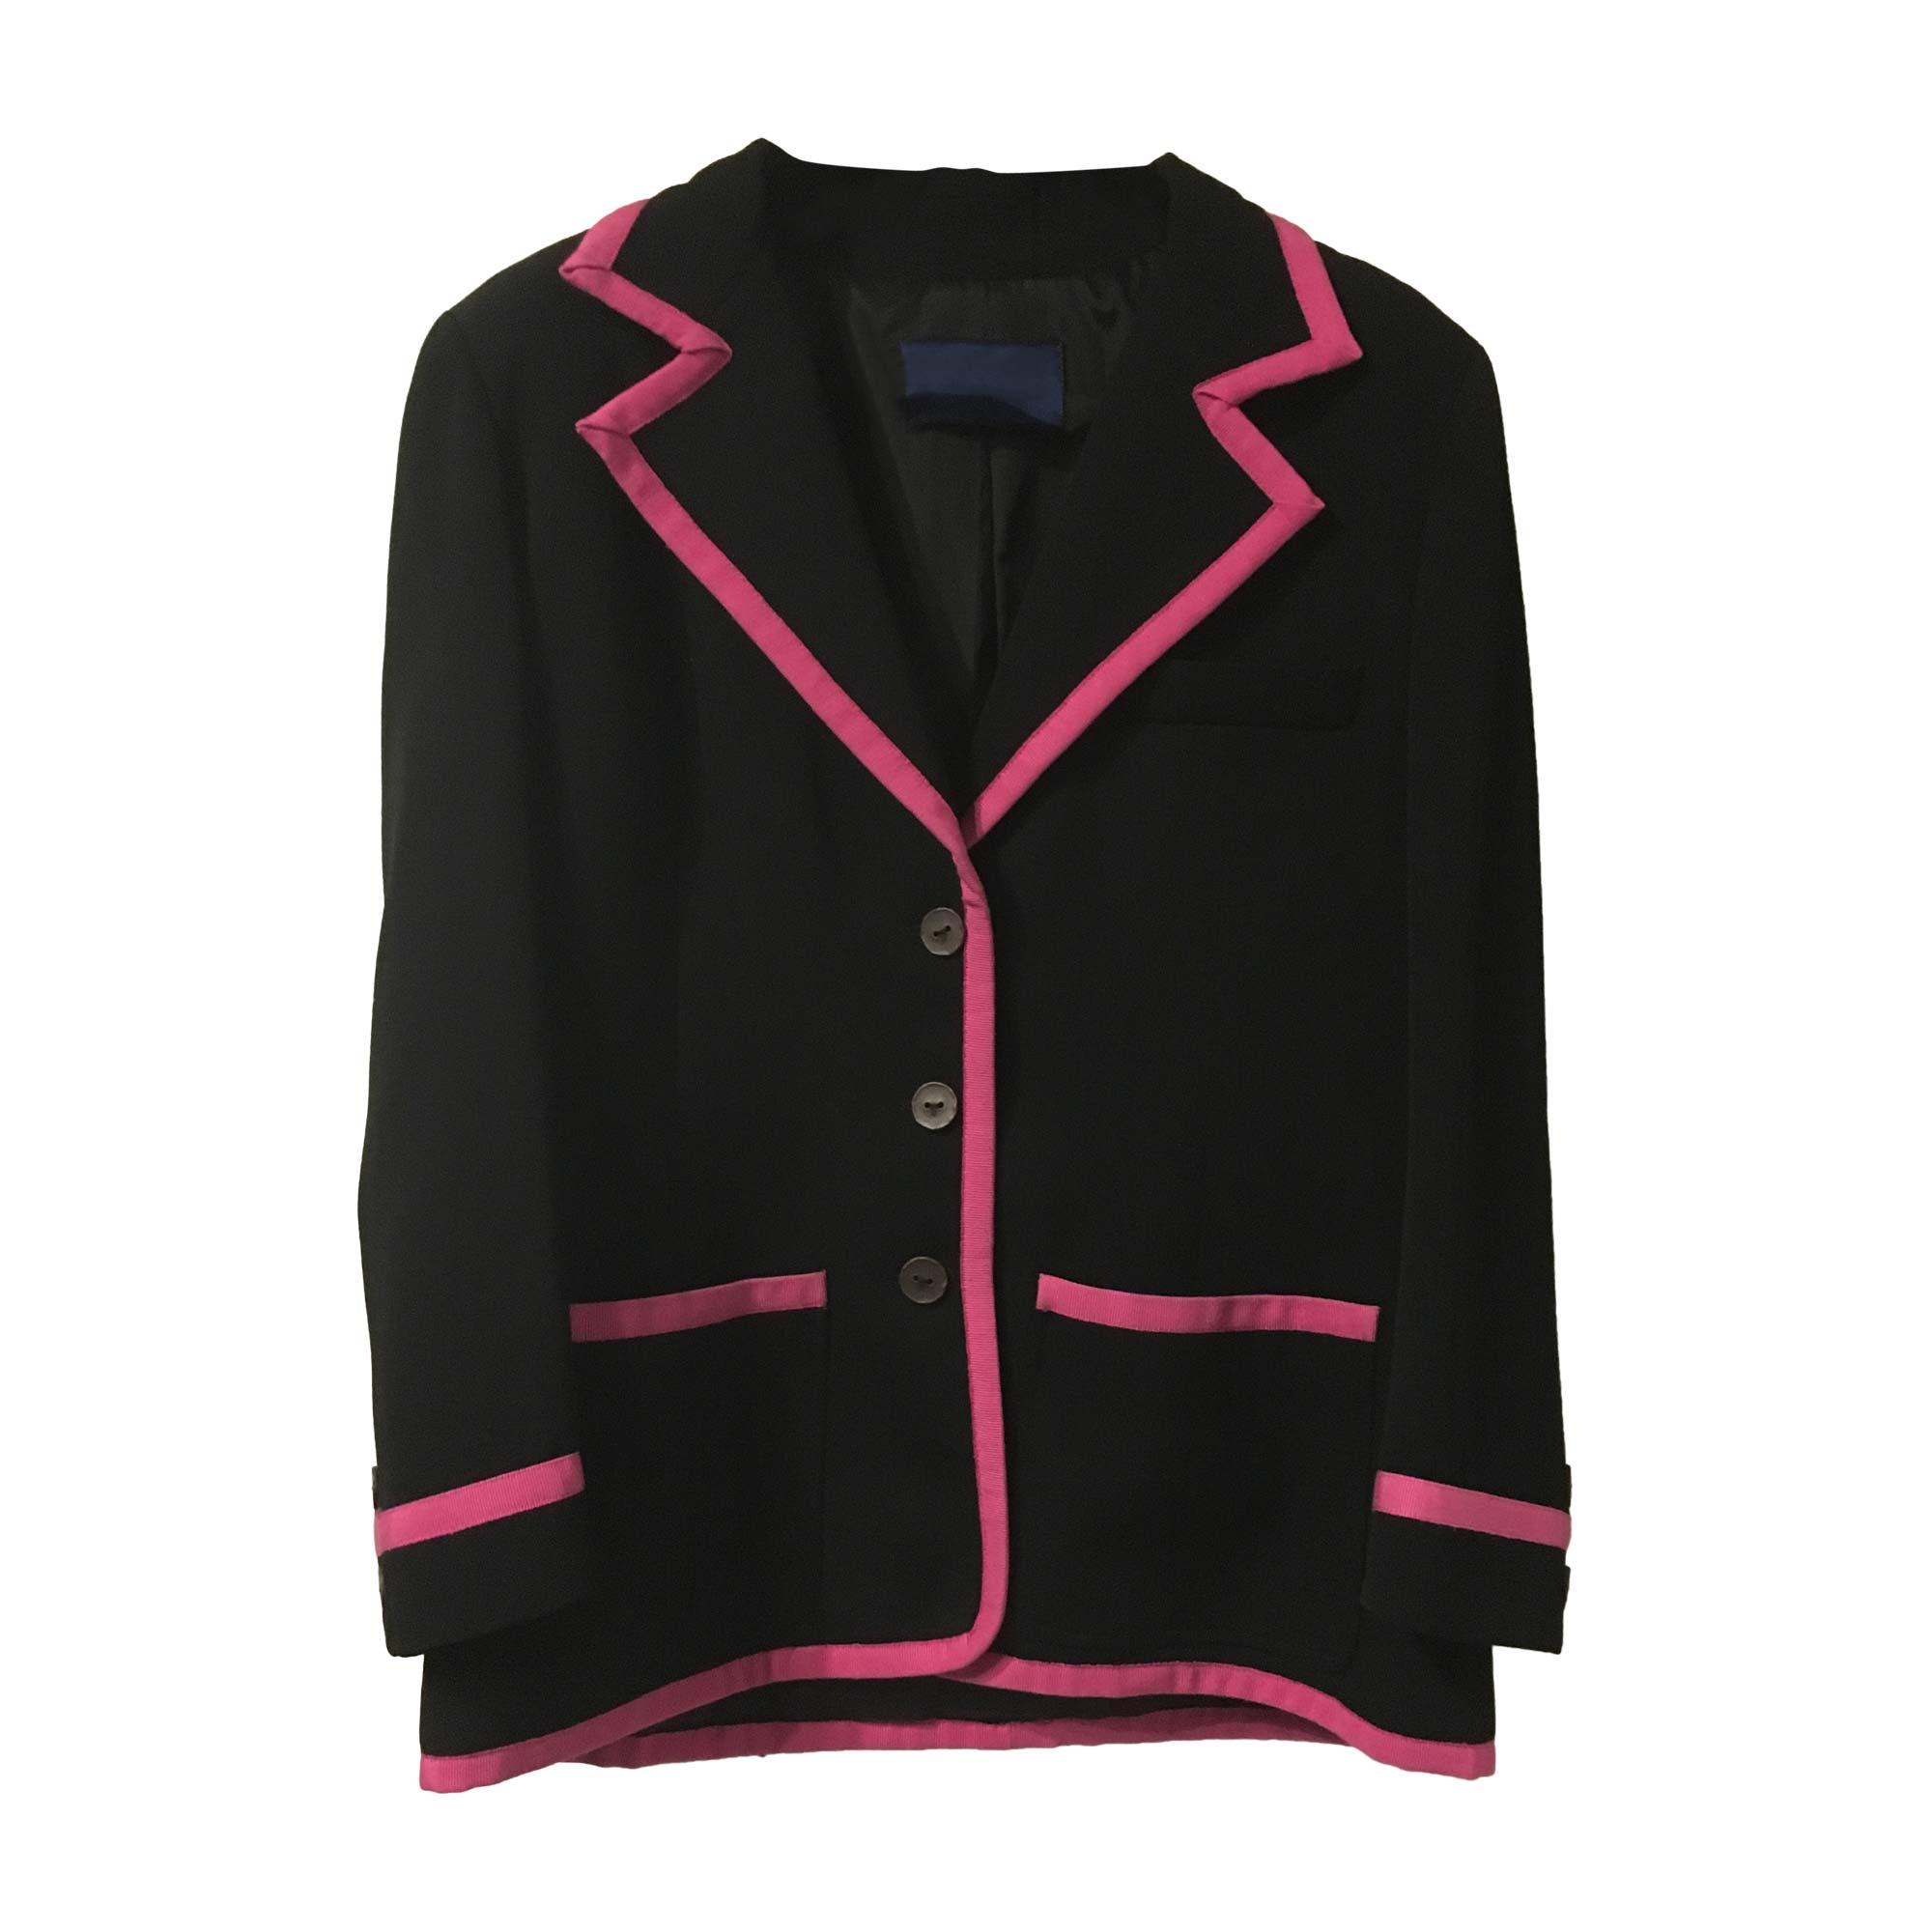 Blazer, veste tailleur BALMAIN Noir